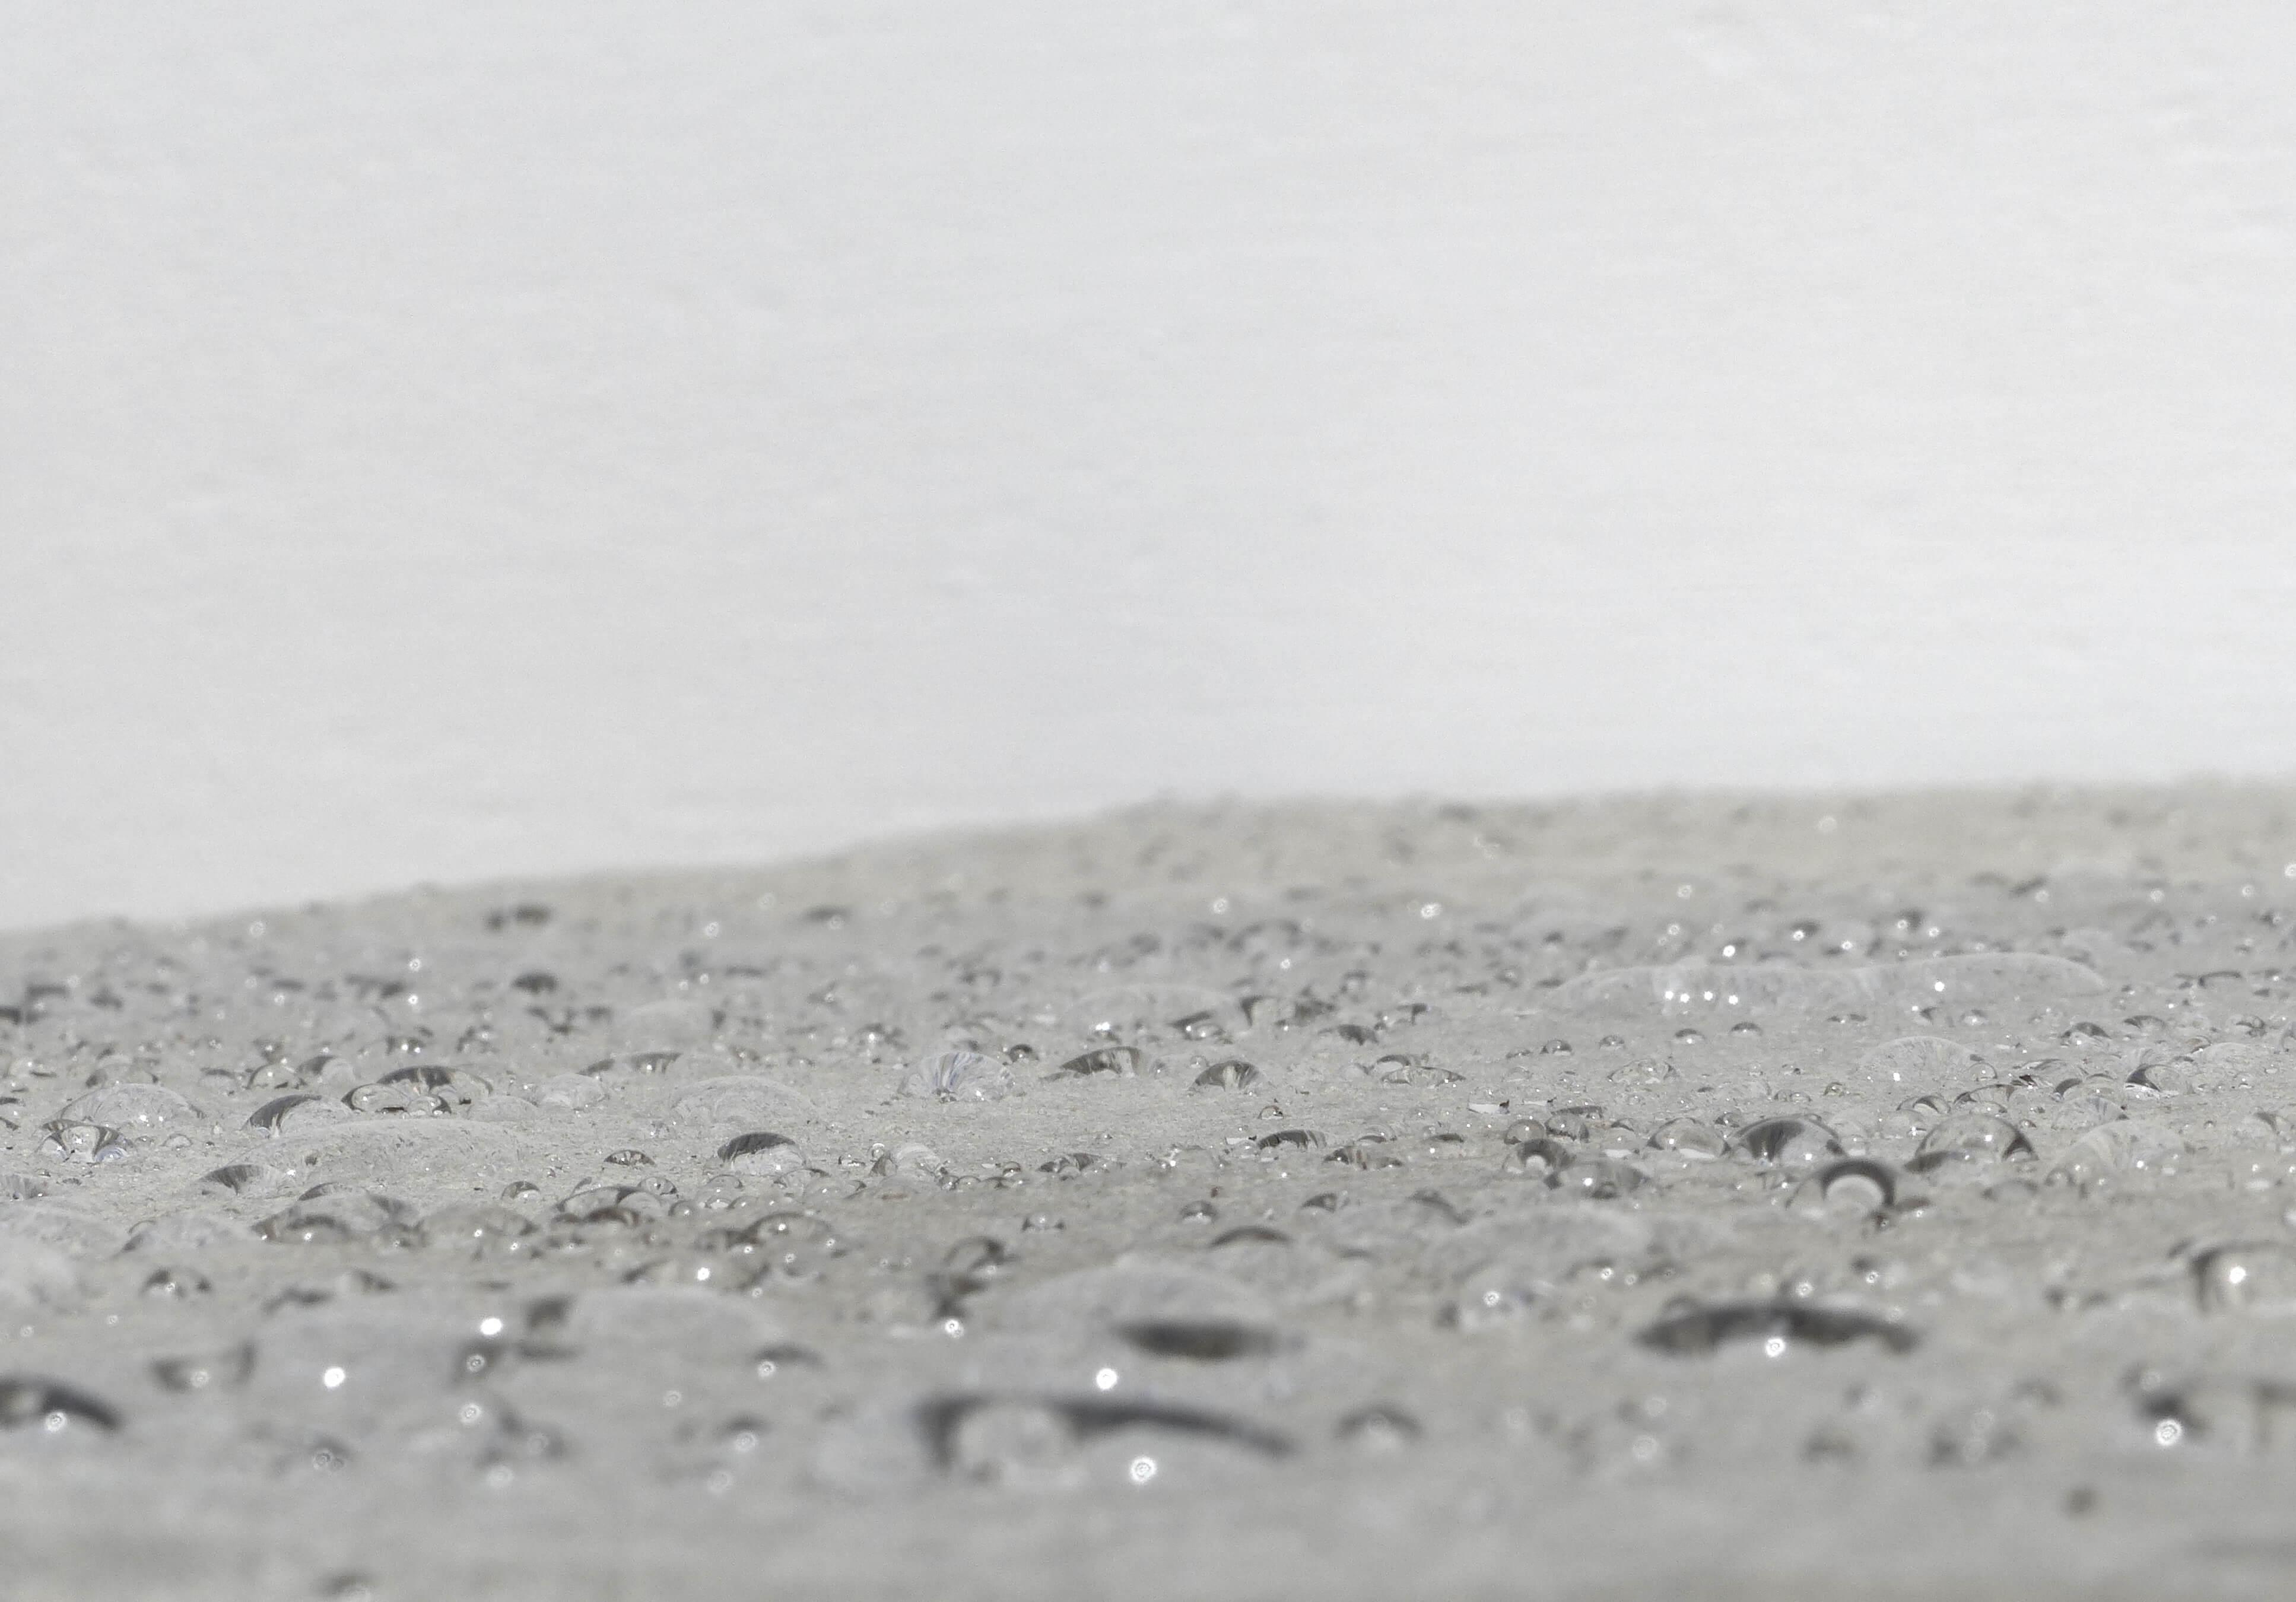 duolan sodif hydrofuge sol incolore traitement pour. Black Bedroom Furniture Sets. Home Design Ideas